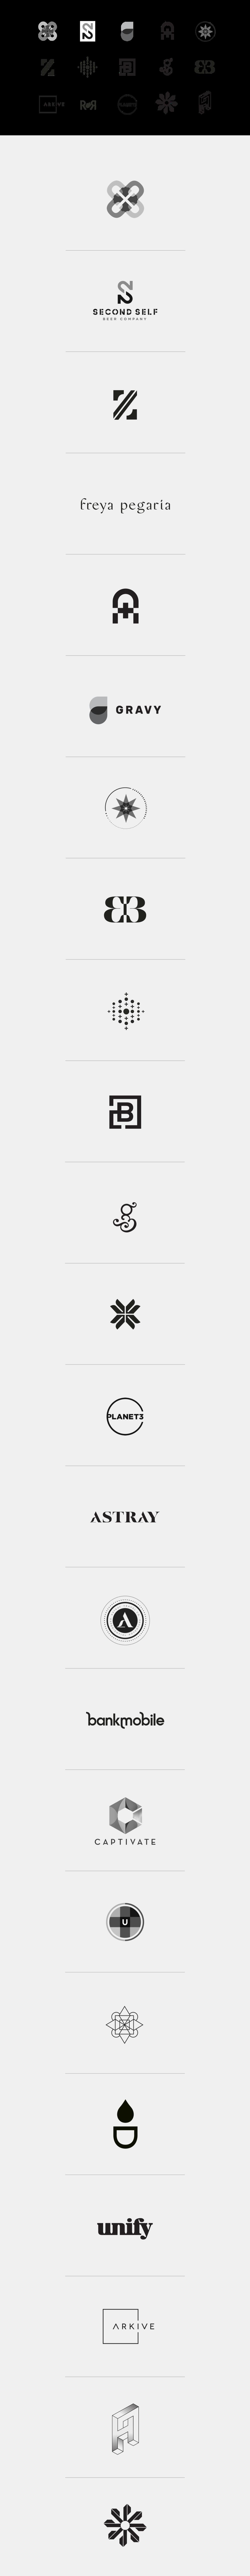 Logos_concepts2.png